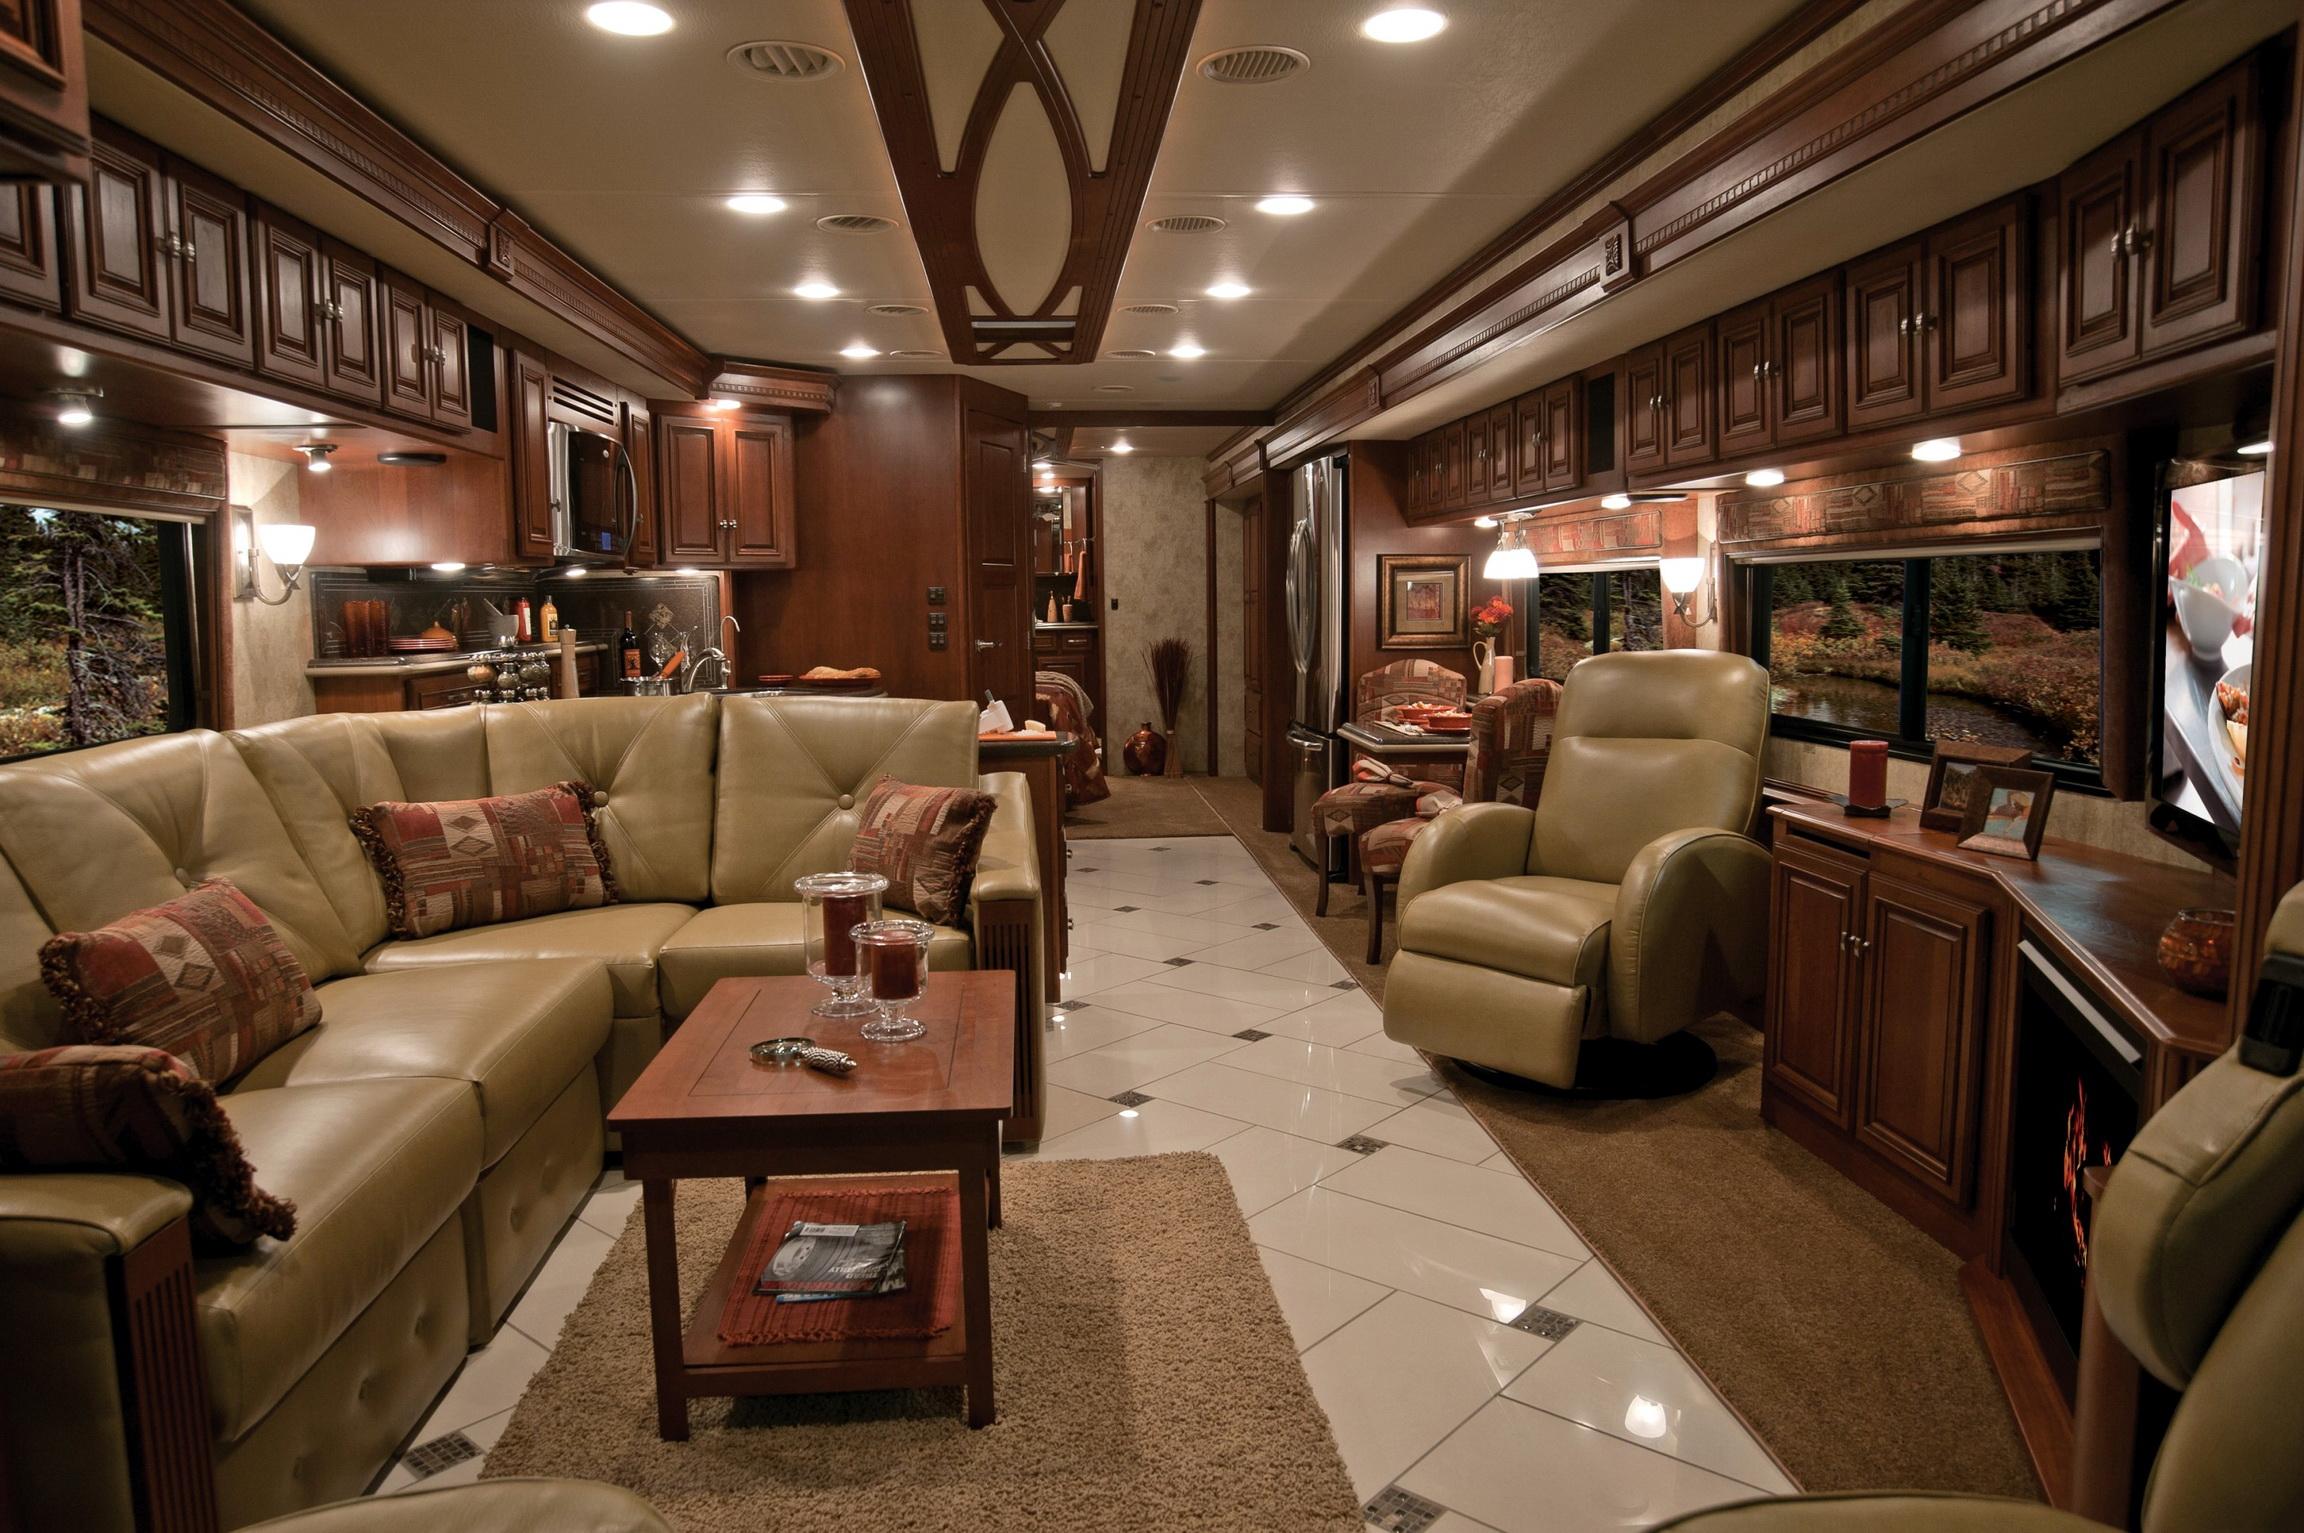 fonds d 39 ecran 2304x1533 am nagement d 39 int rieur divan oreiller fauteuil plafond design salle de. Black Bedroom Furniture Sets. Home Design Ideas